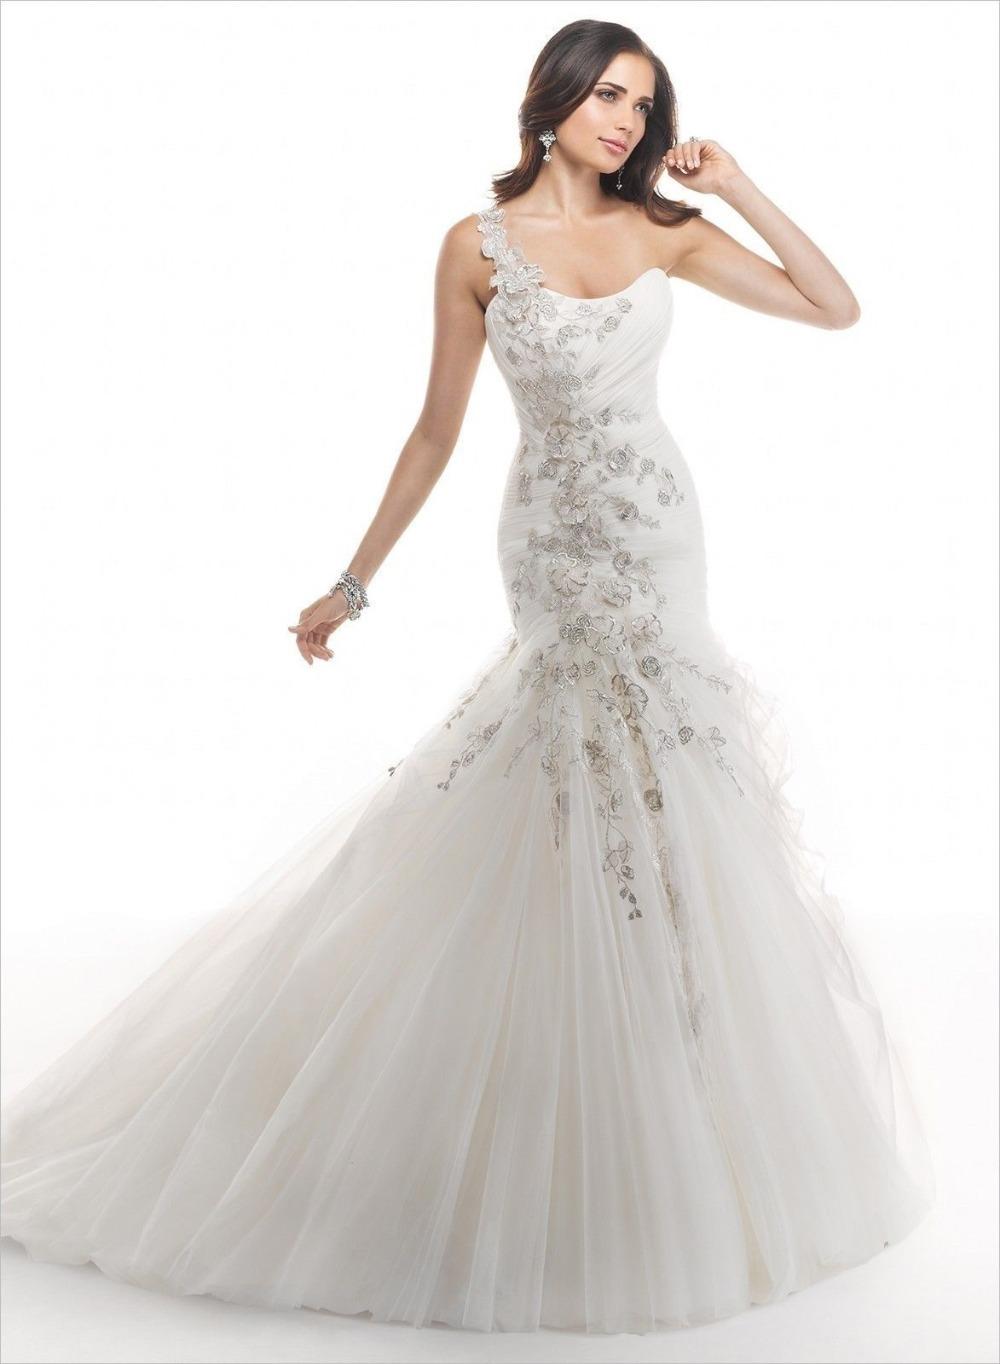 white shoulder lace wedding dress